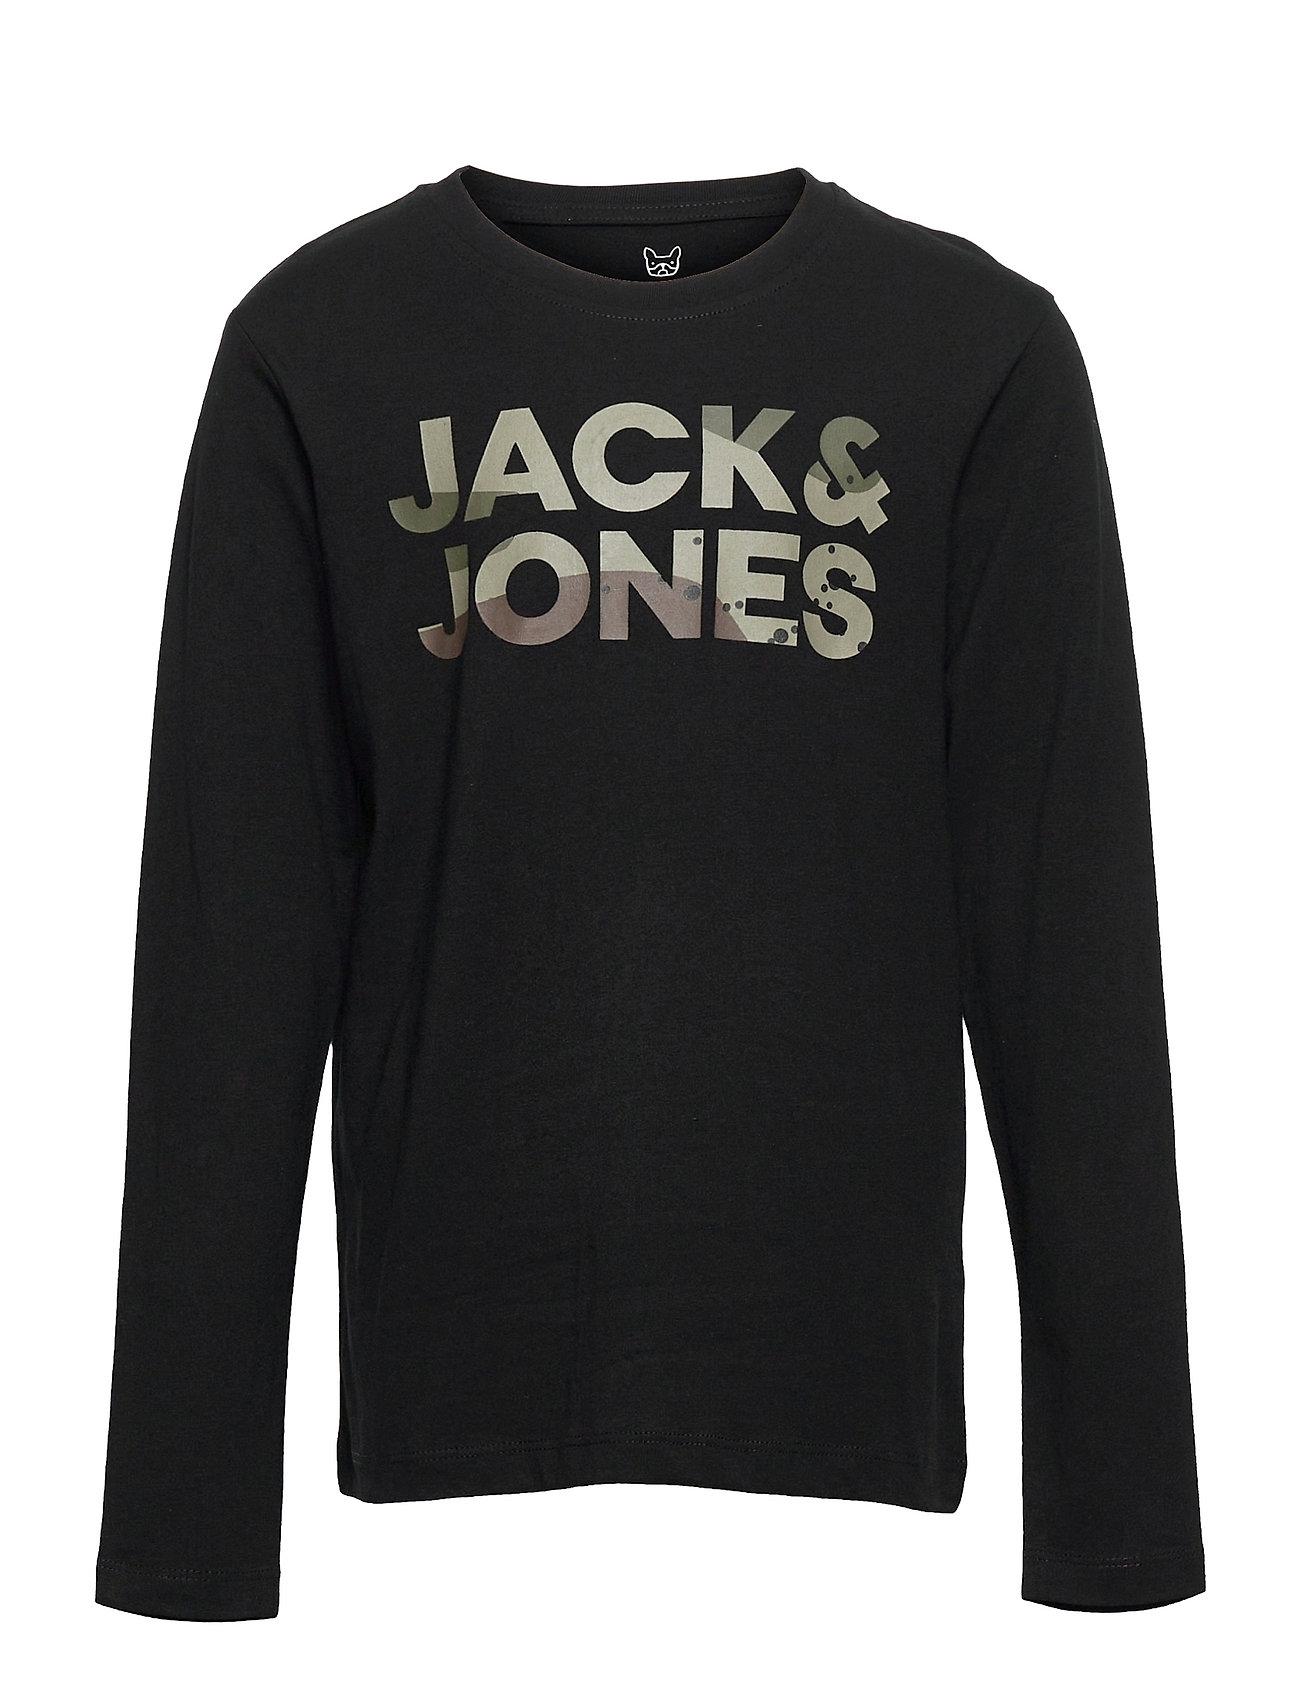 Jcodolan Tee Ls Crew Neck Jr Langærmet T-shirt Sort Jack & J S